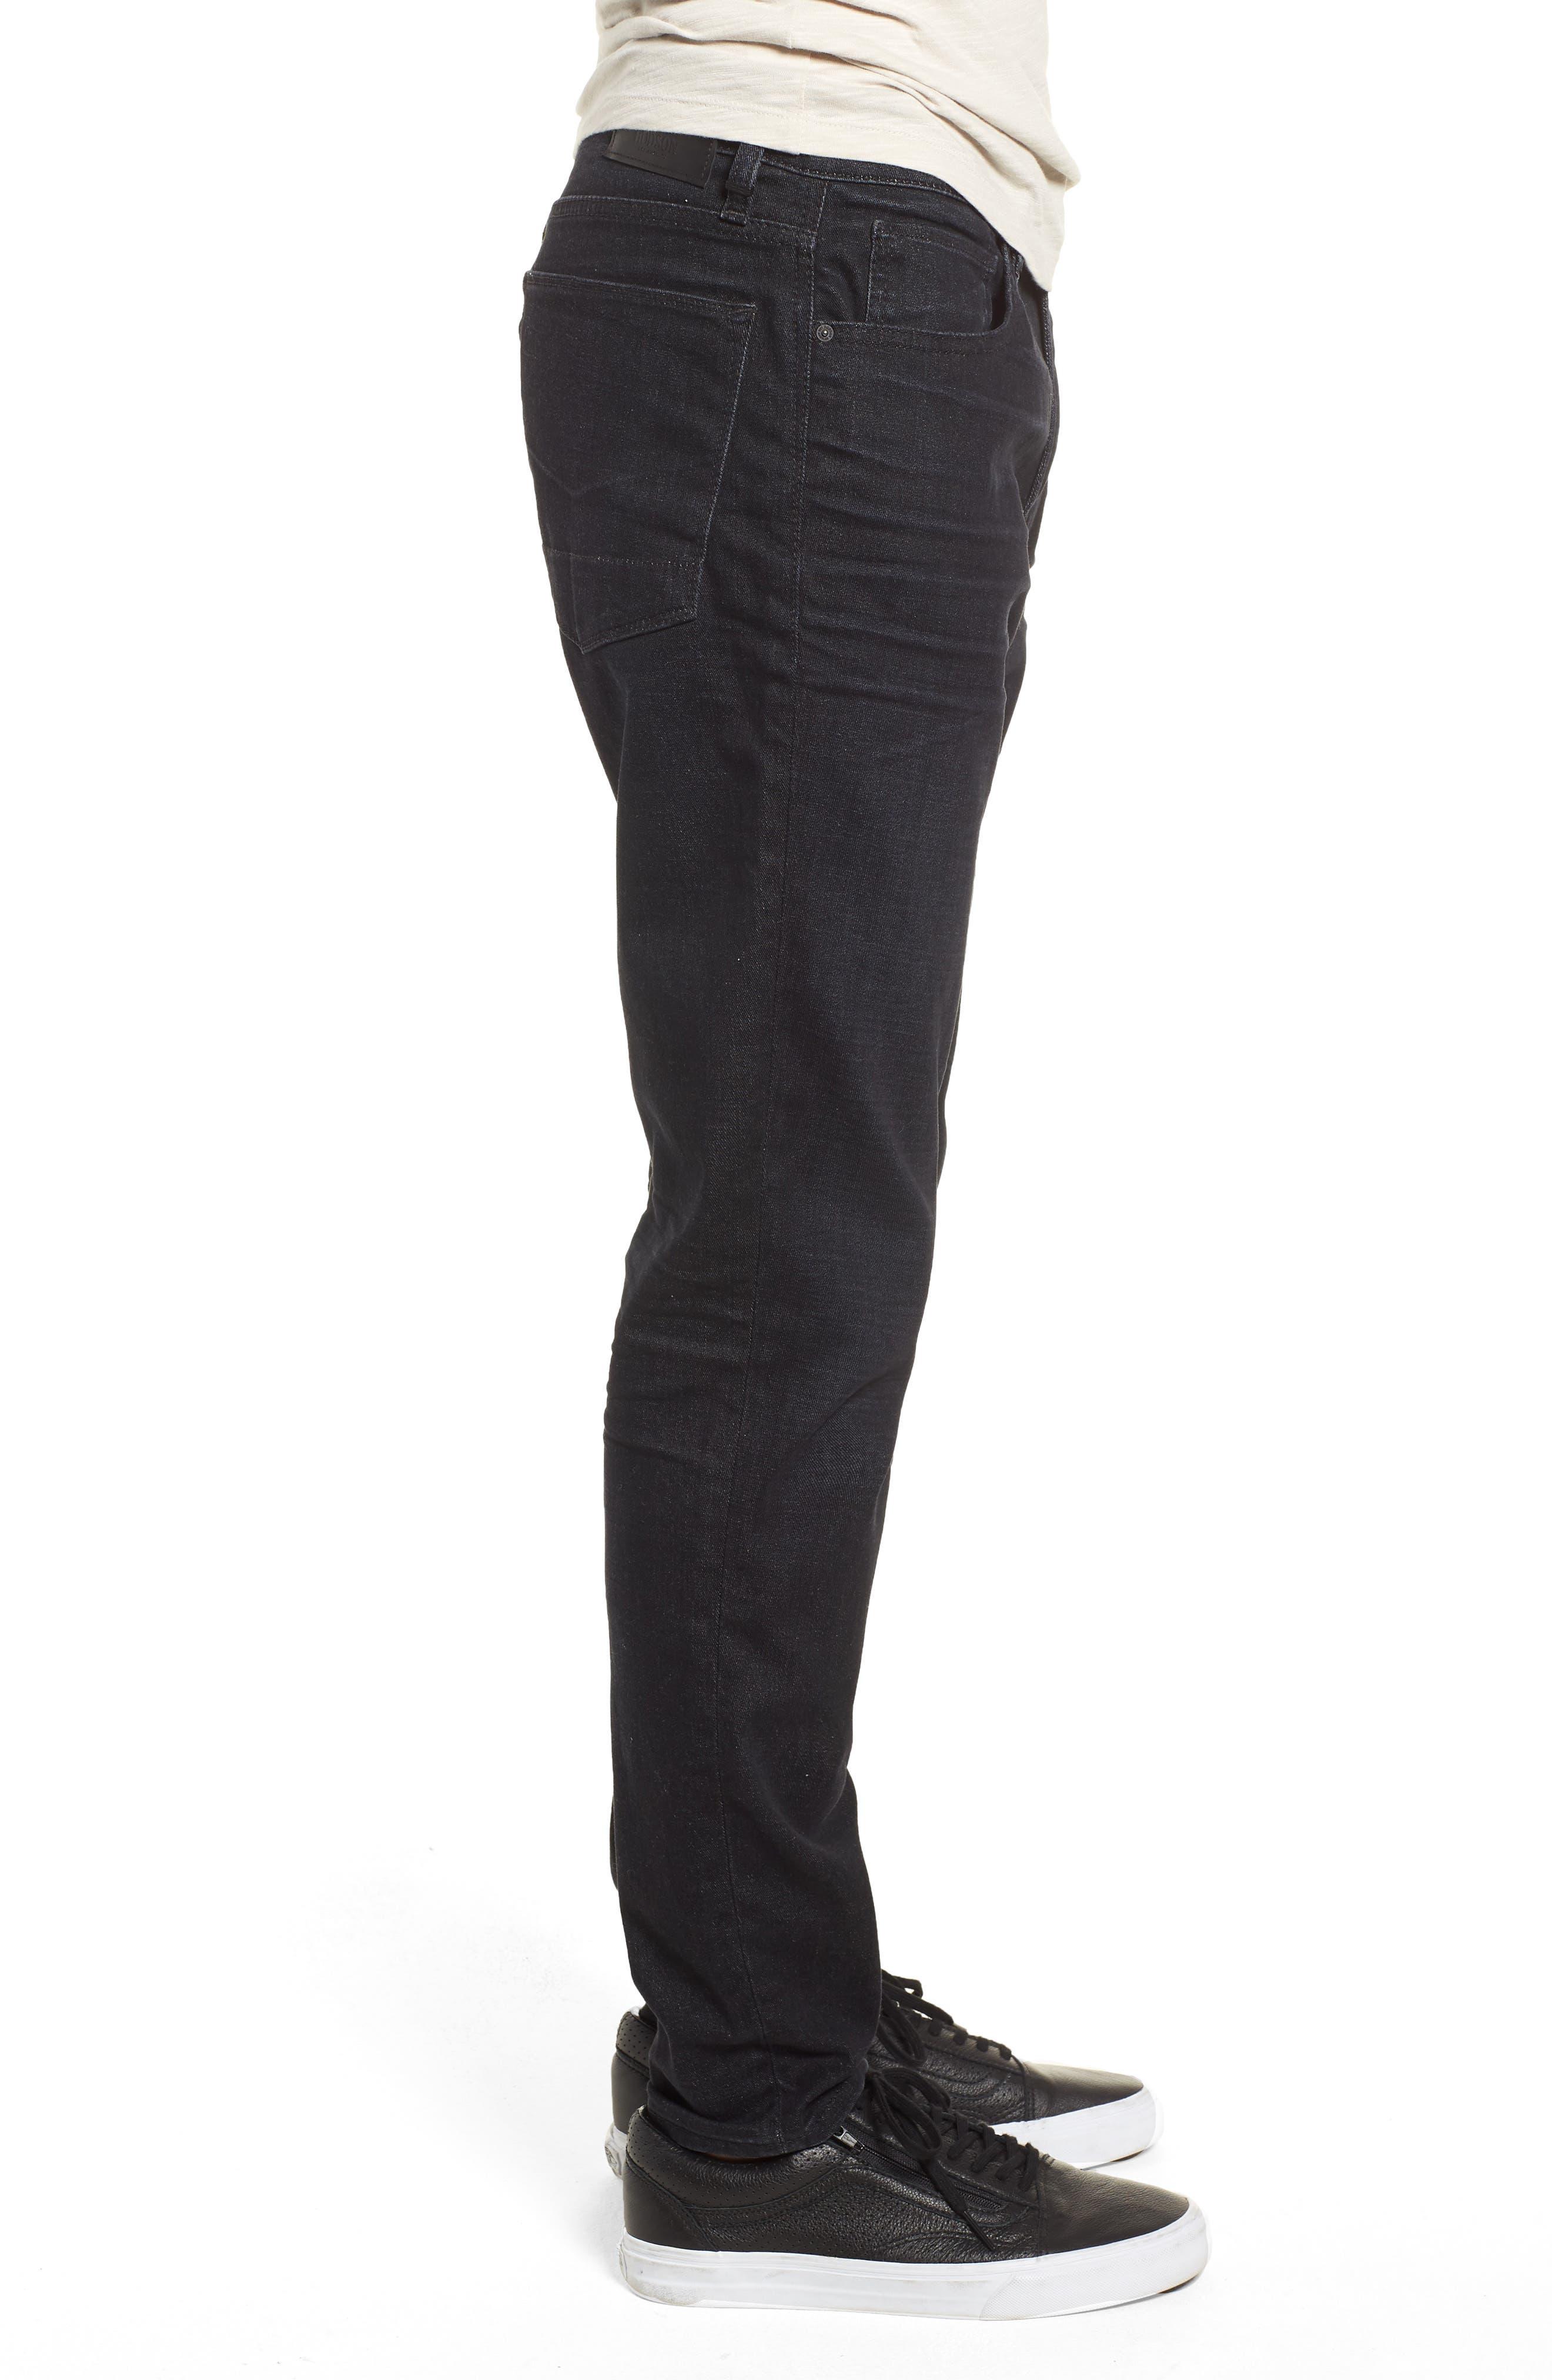 Zack Skinny Fit Jeans,                             Alternate thumbnail 3, color,                             001